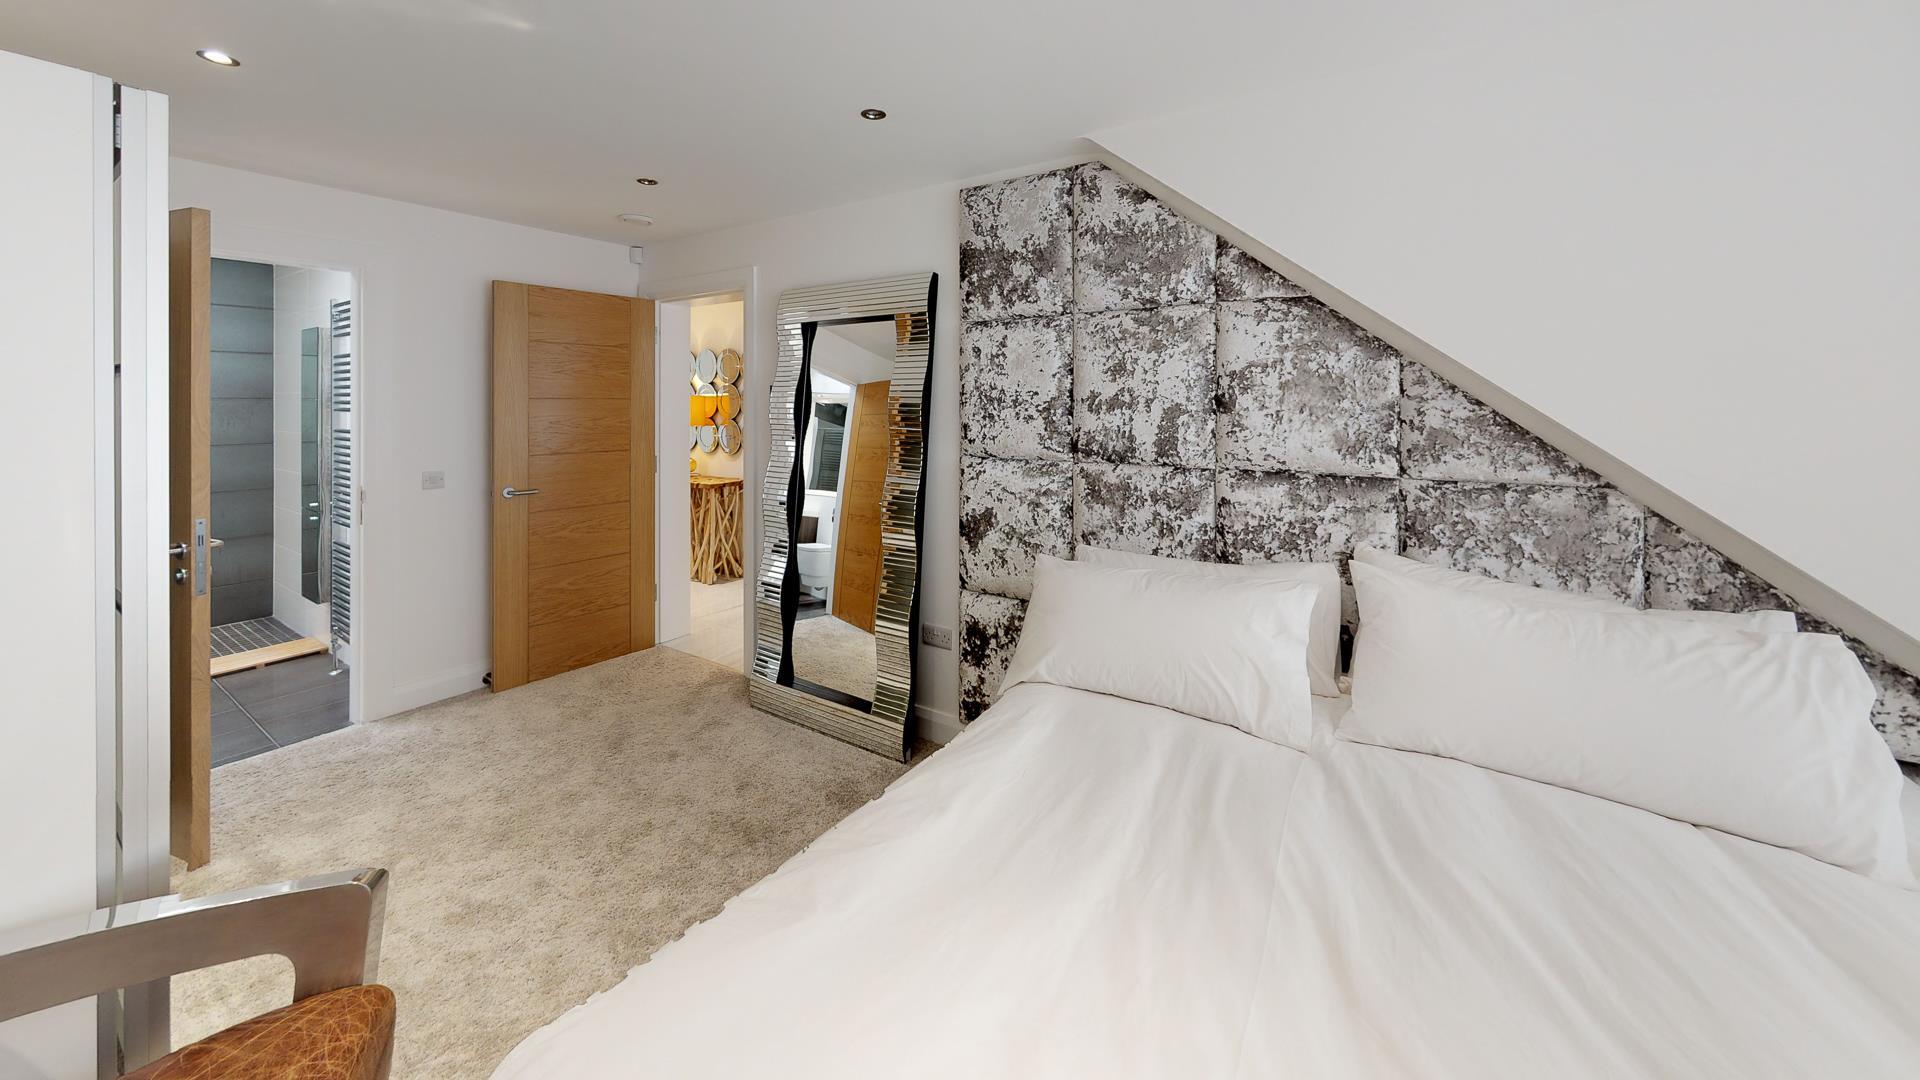 The-Pent-House-at-Sandy-Bay-Portrush-Bedroom.jpg